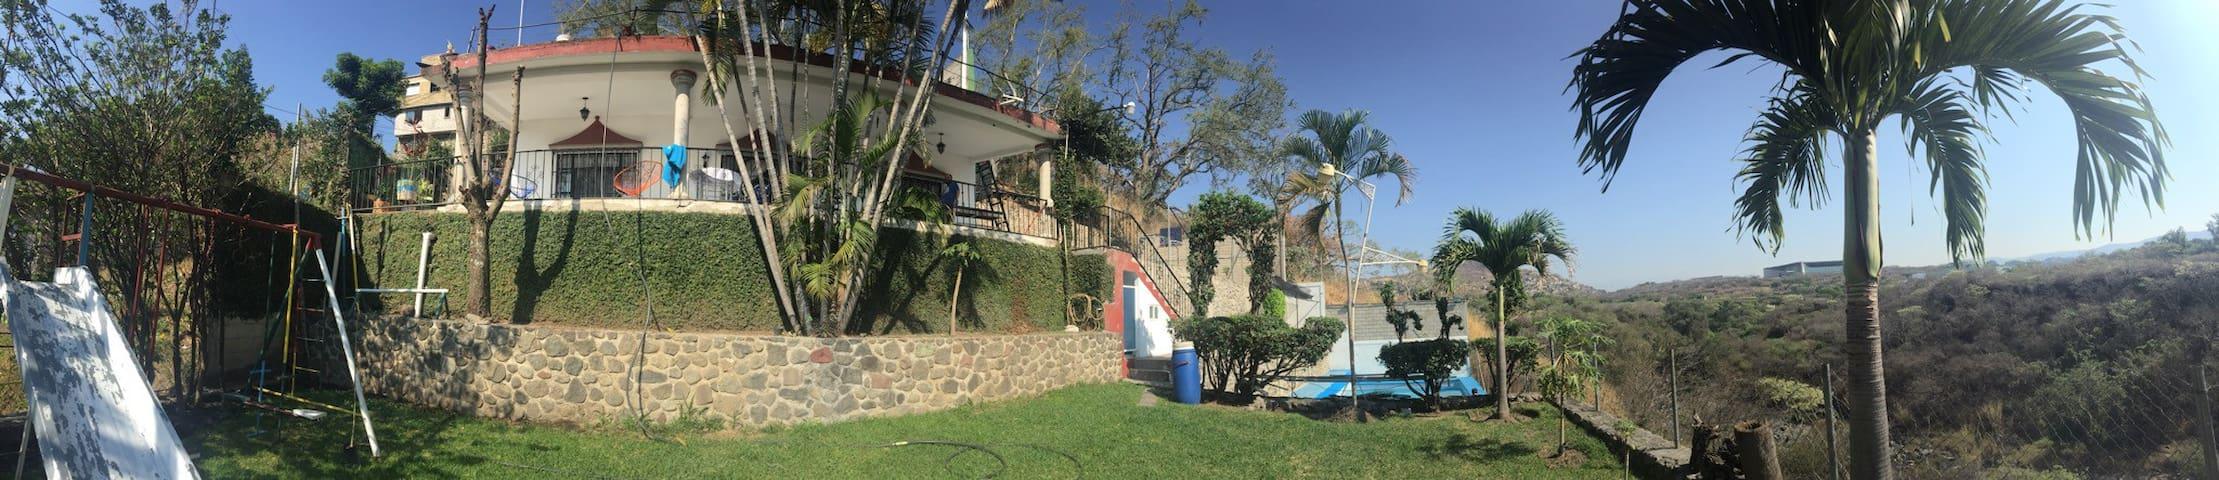 Casa Xochitepec Morelos - Xochitepec - Haus